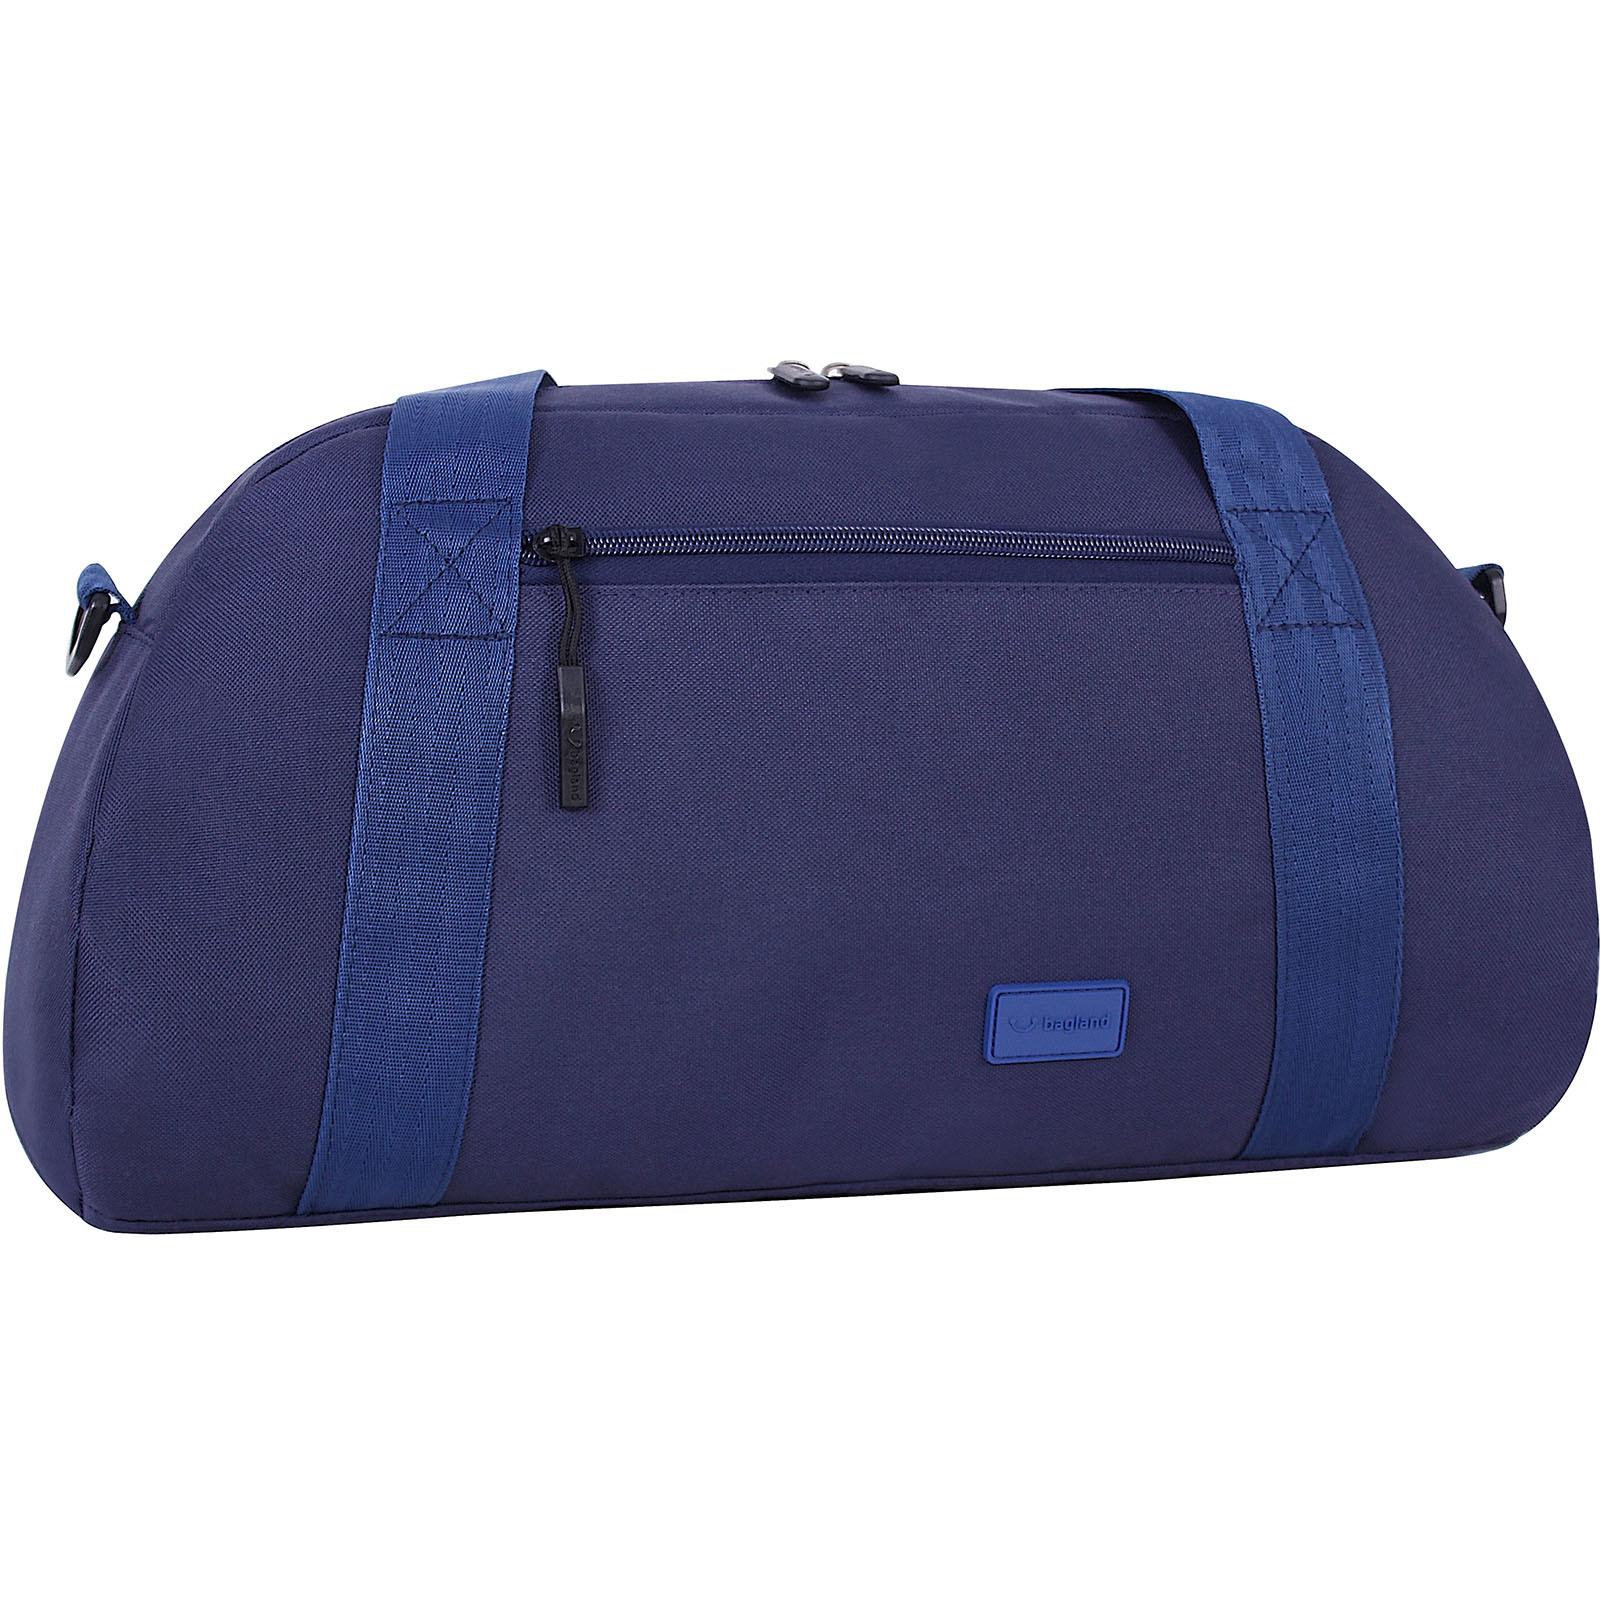 Спортивные сумки Сумка Bagland Oblivion 27 л. Синий (0037366) IMG_7061.JPG